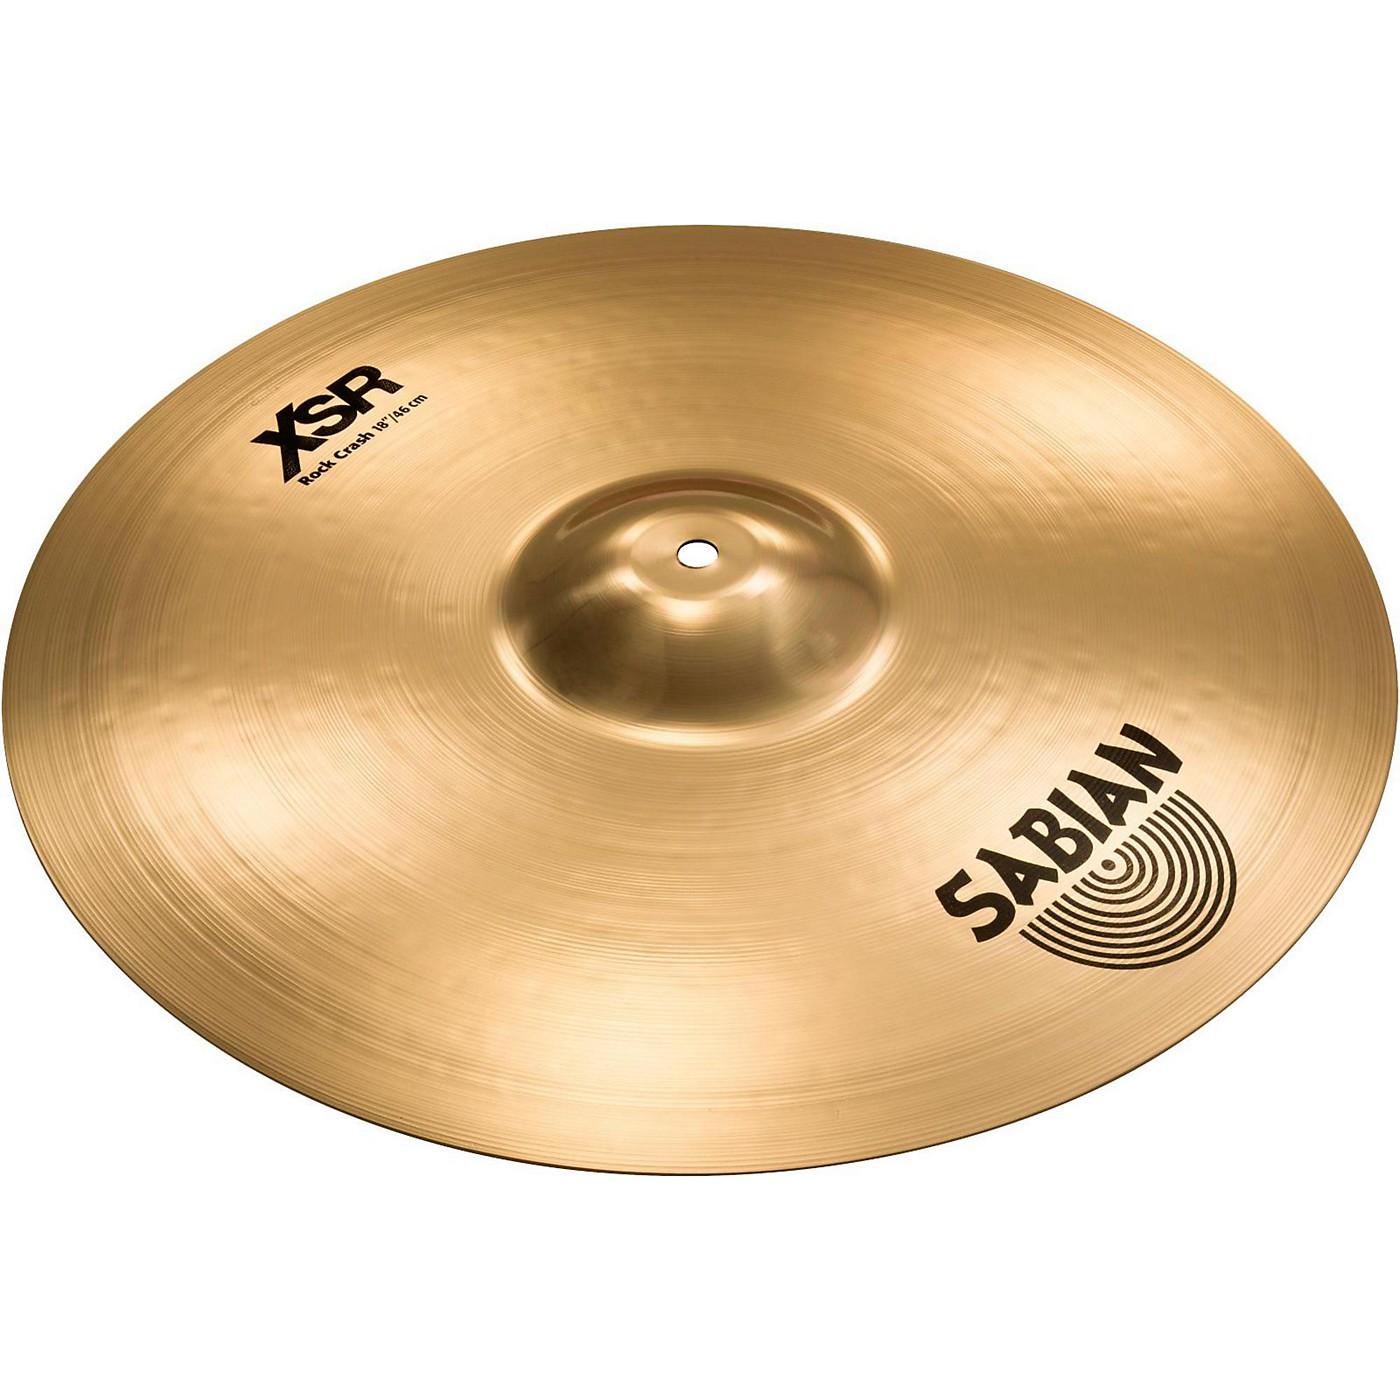 Sabian XSR Series Rock Crash Cymbal thumbnail